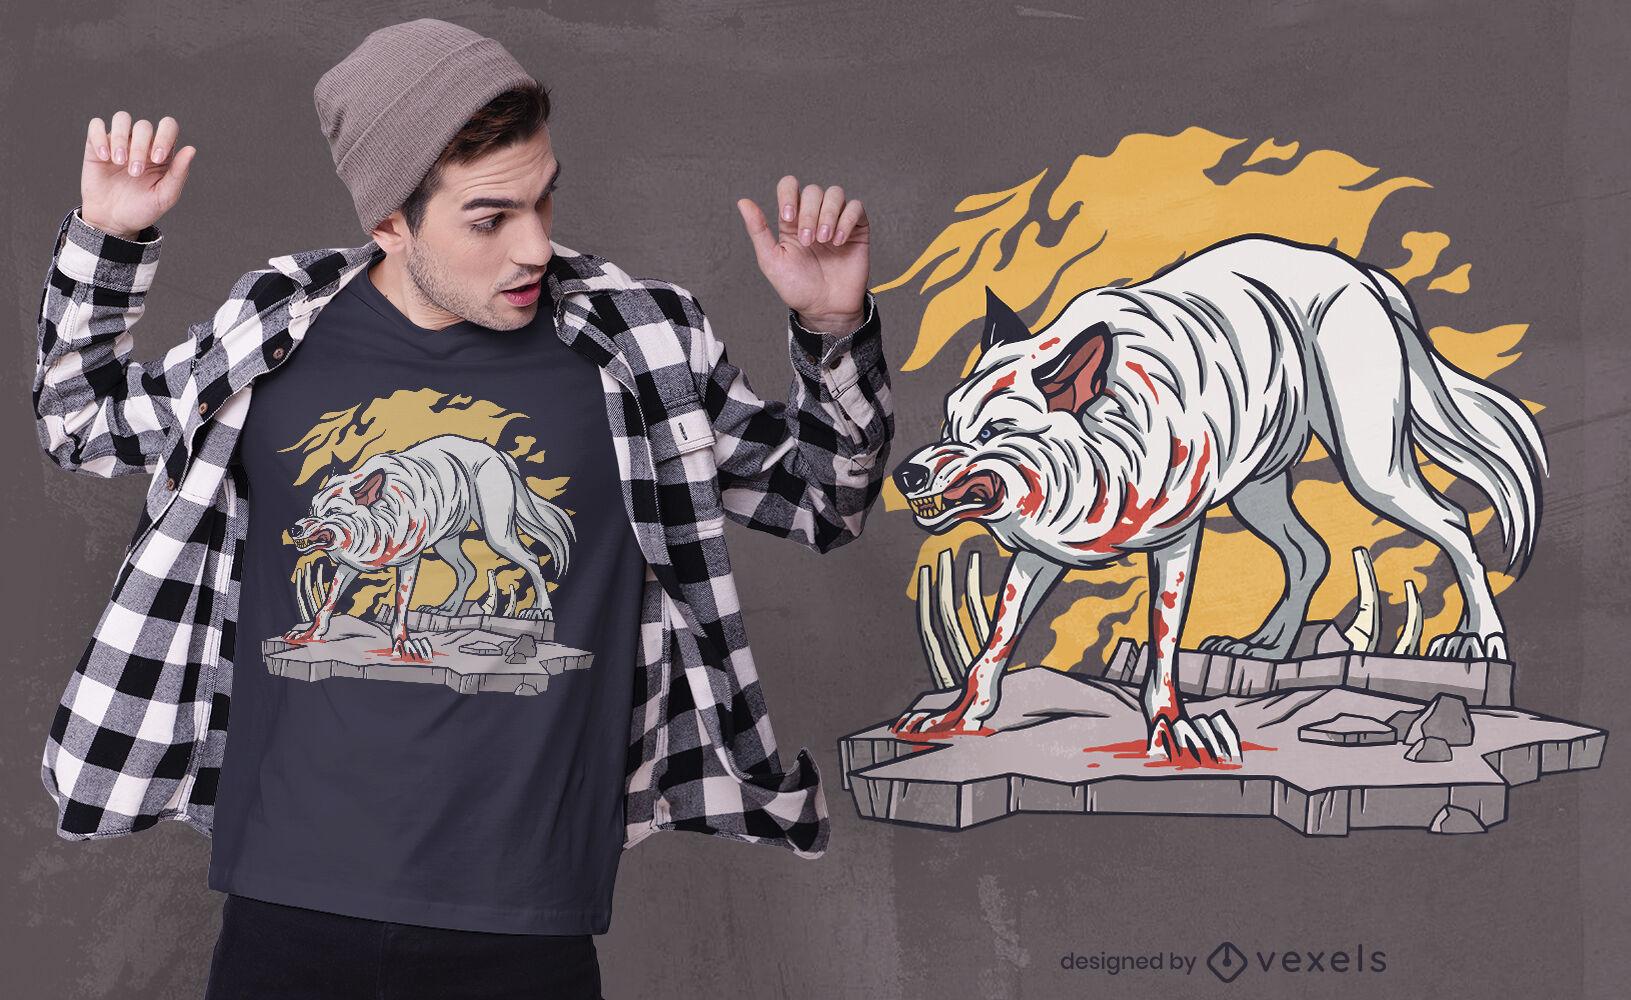 Bloody wolf t-shirt design